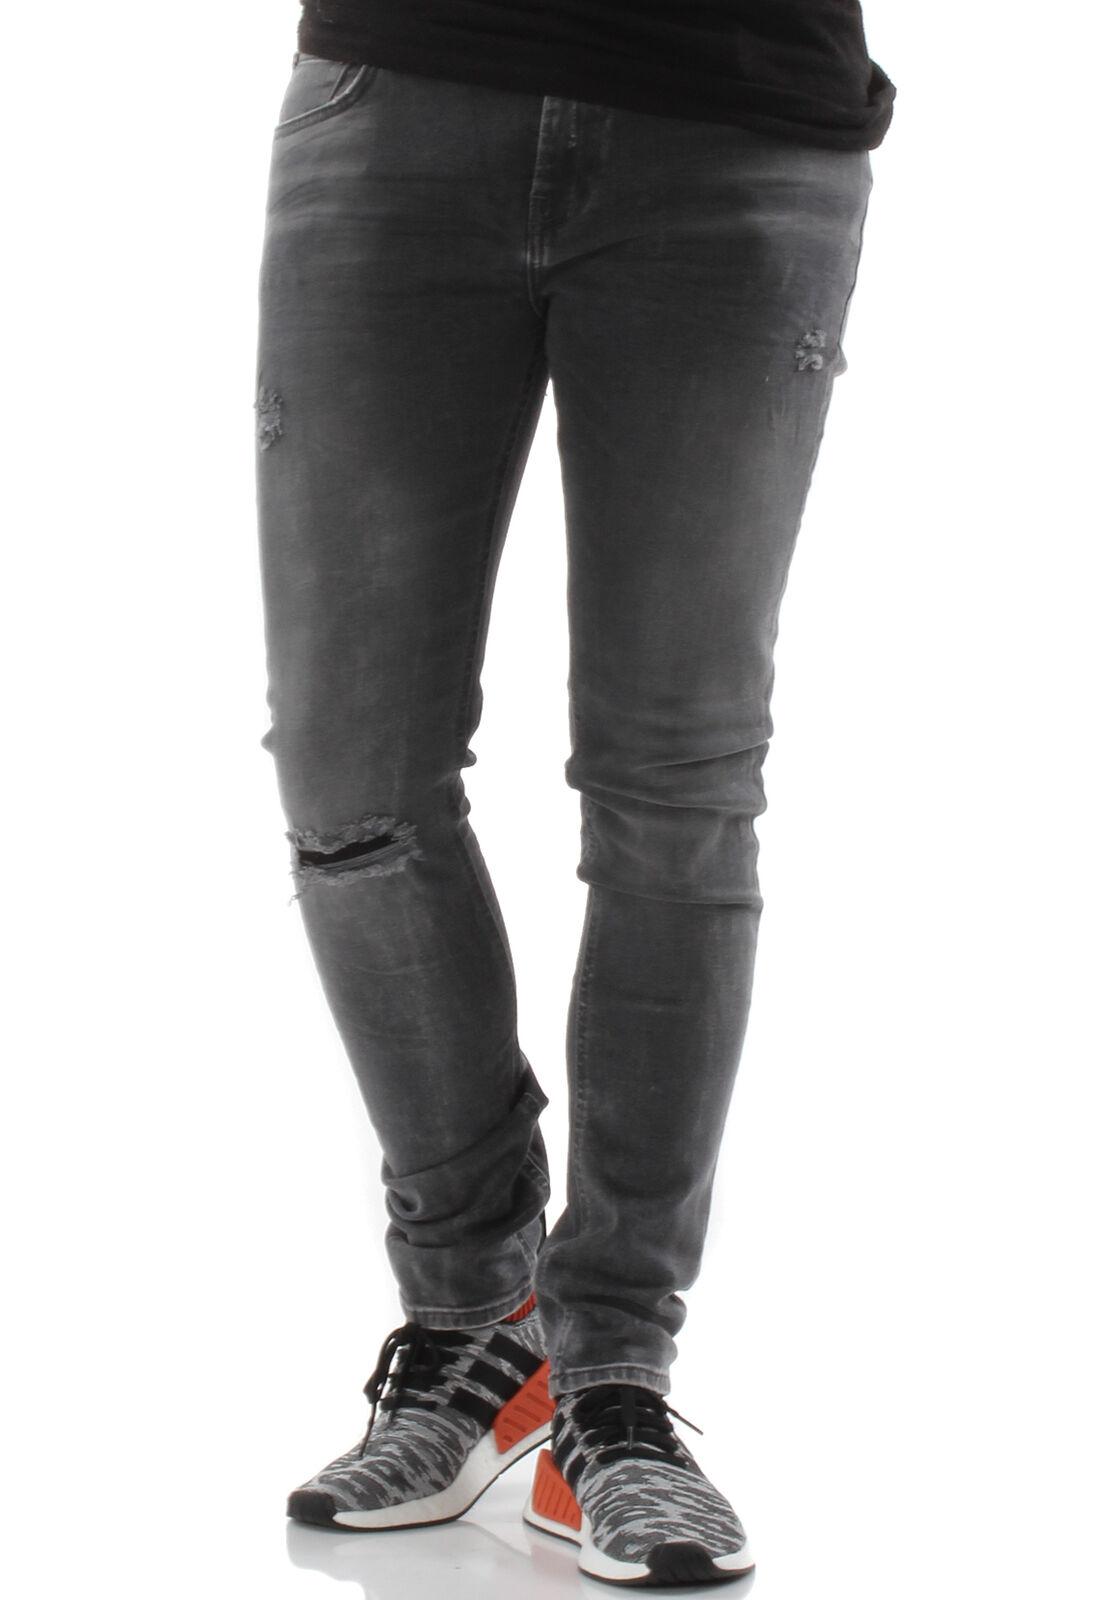 LTB Men's Jeans Smarty orimer Wash